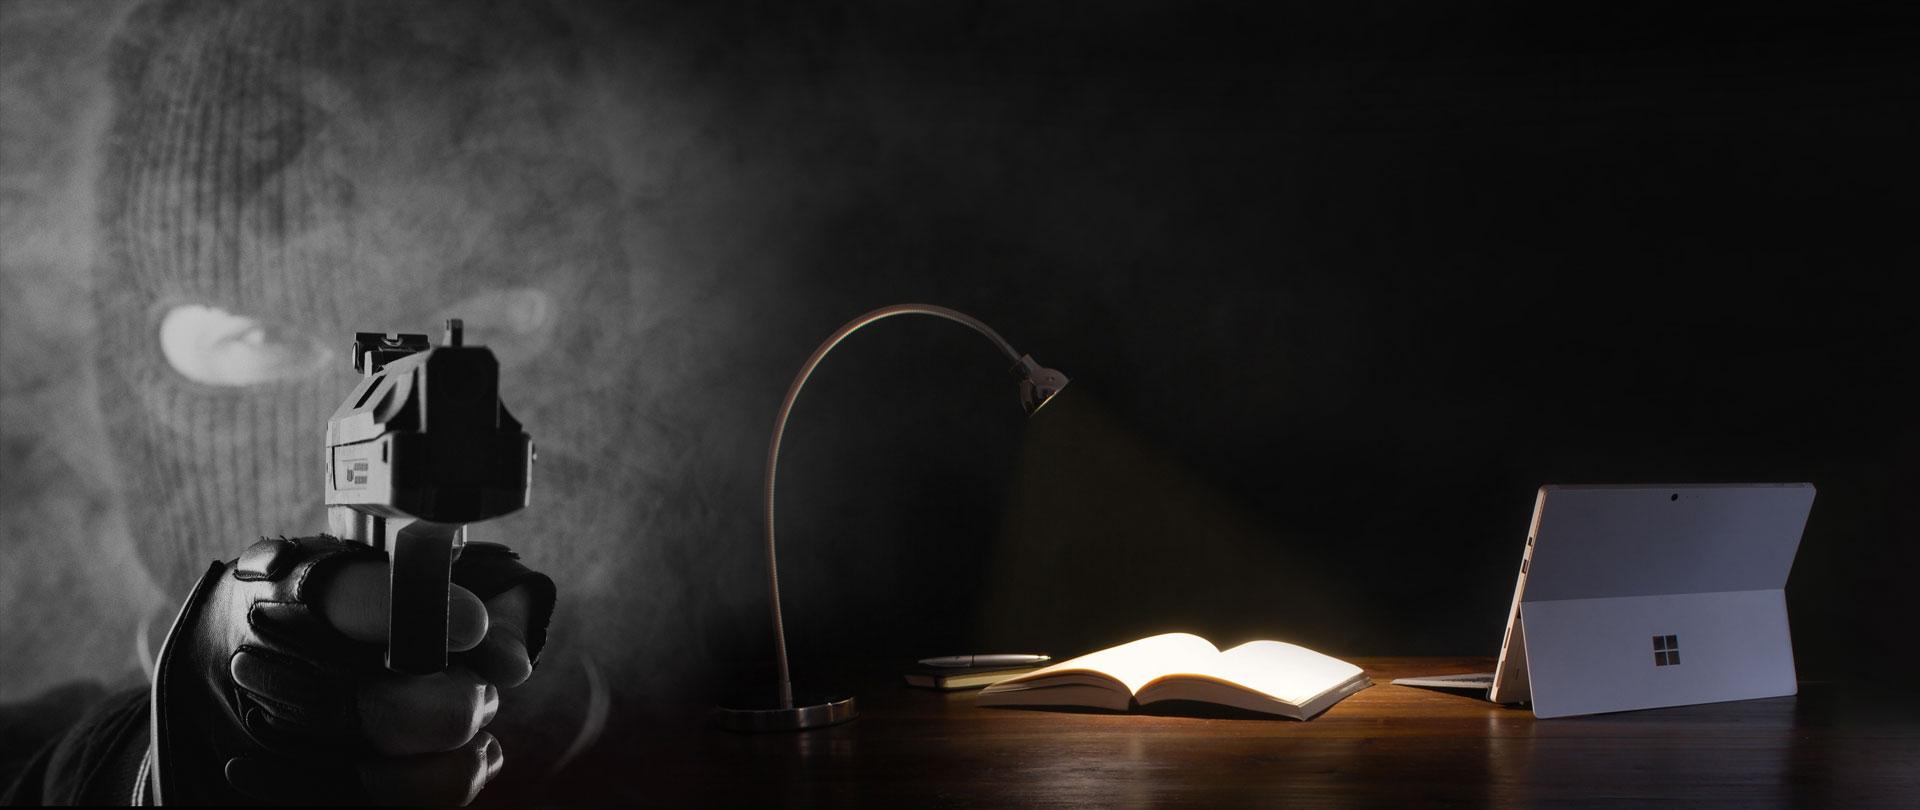 Books by Stephen B King